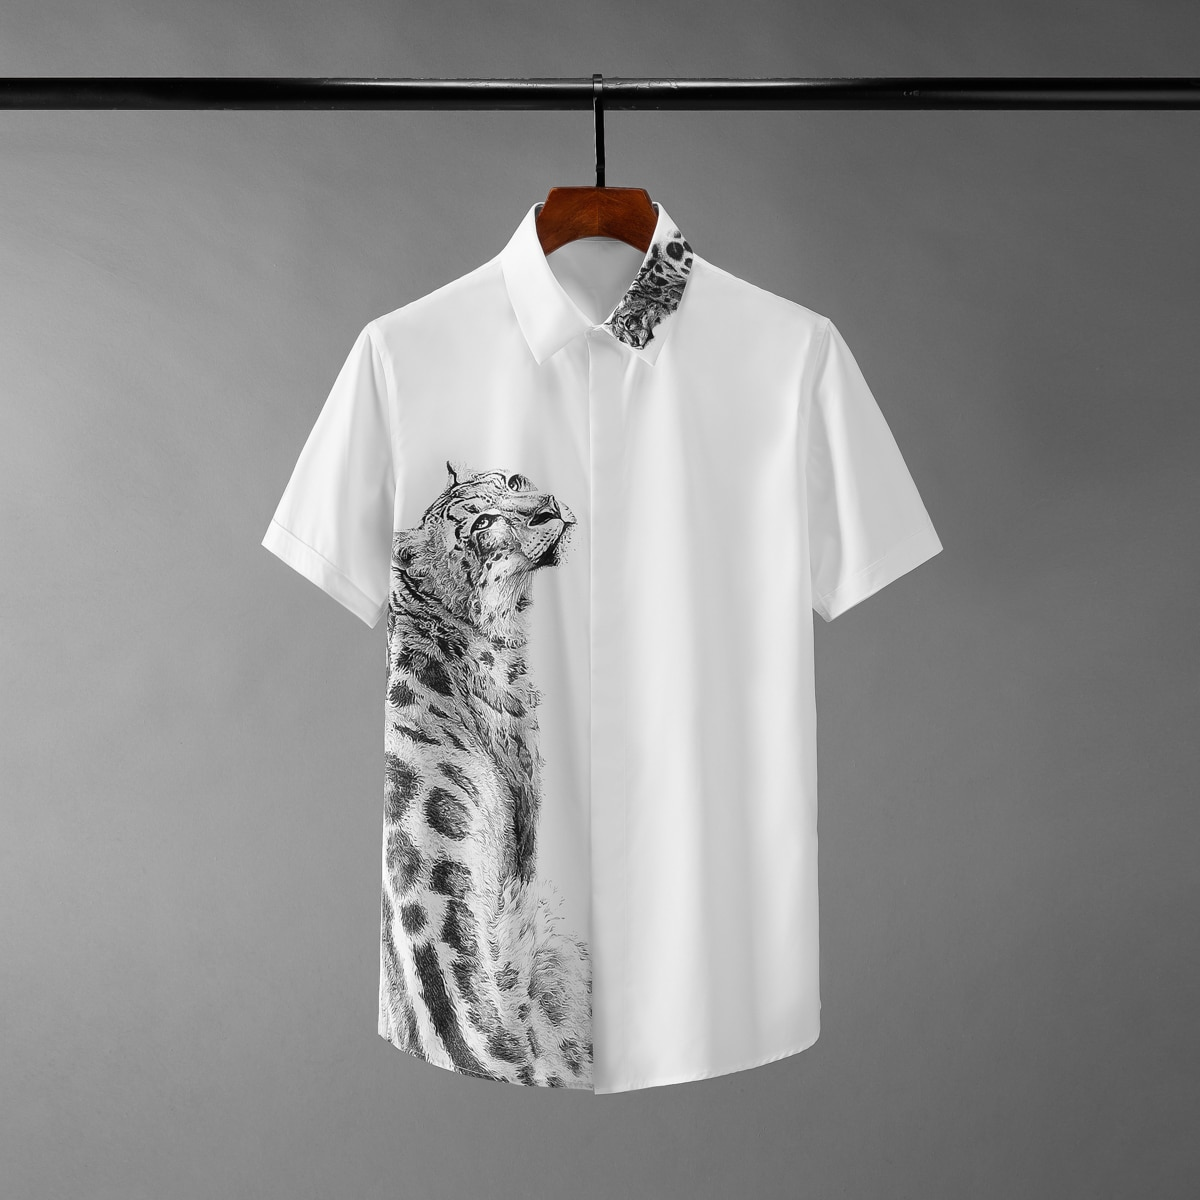 Minglu ليوبارد المطبوعة الصيف الذكور قمصان الفاخرة قصيرة الأكمام الرجال القمصان الأزياء سليم صالح حزب رجل قمصان زائد حجم 4xl